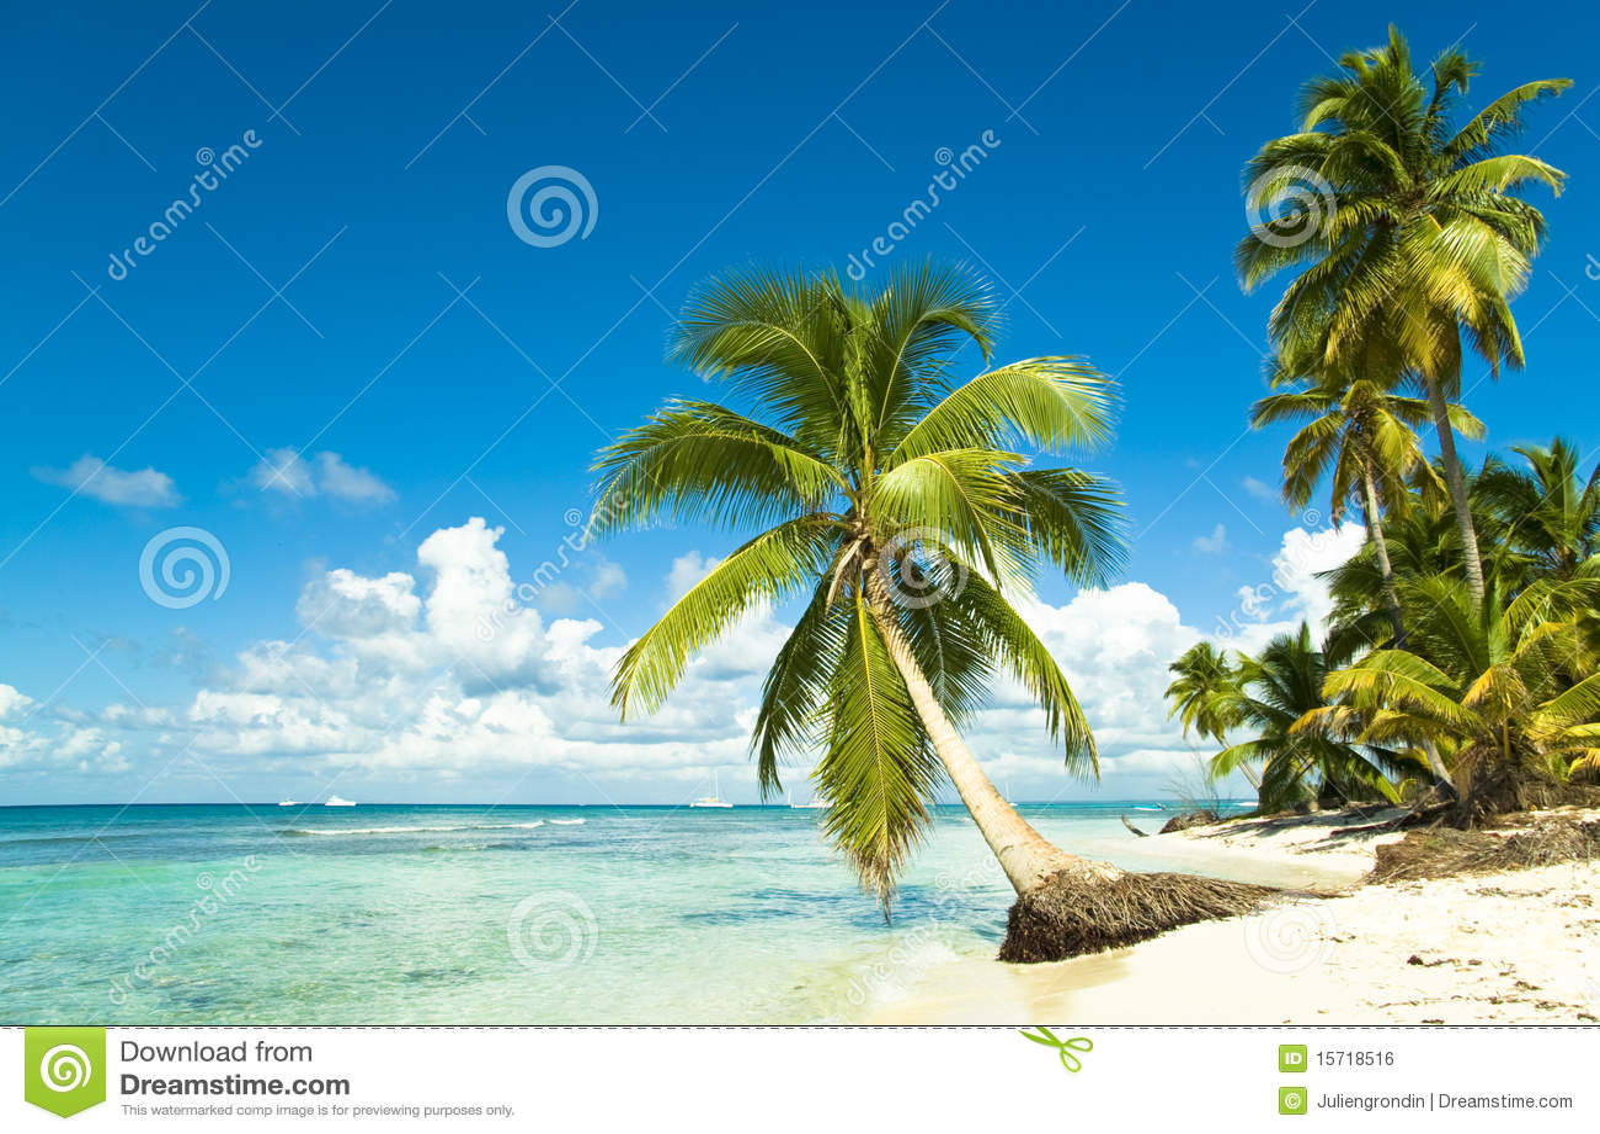 Playa tropical idílica